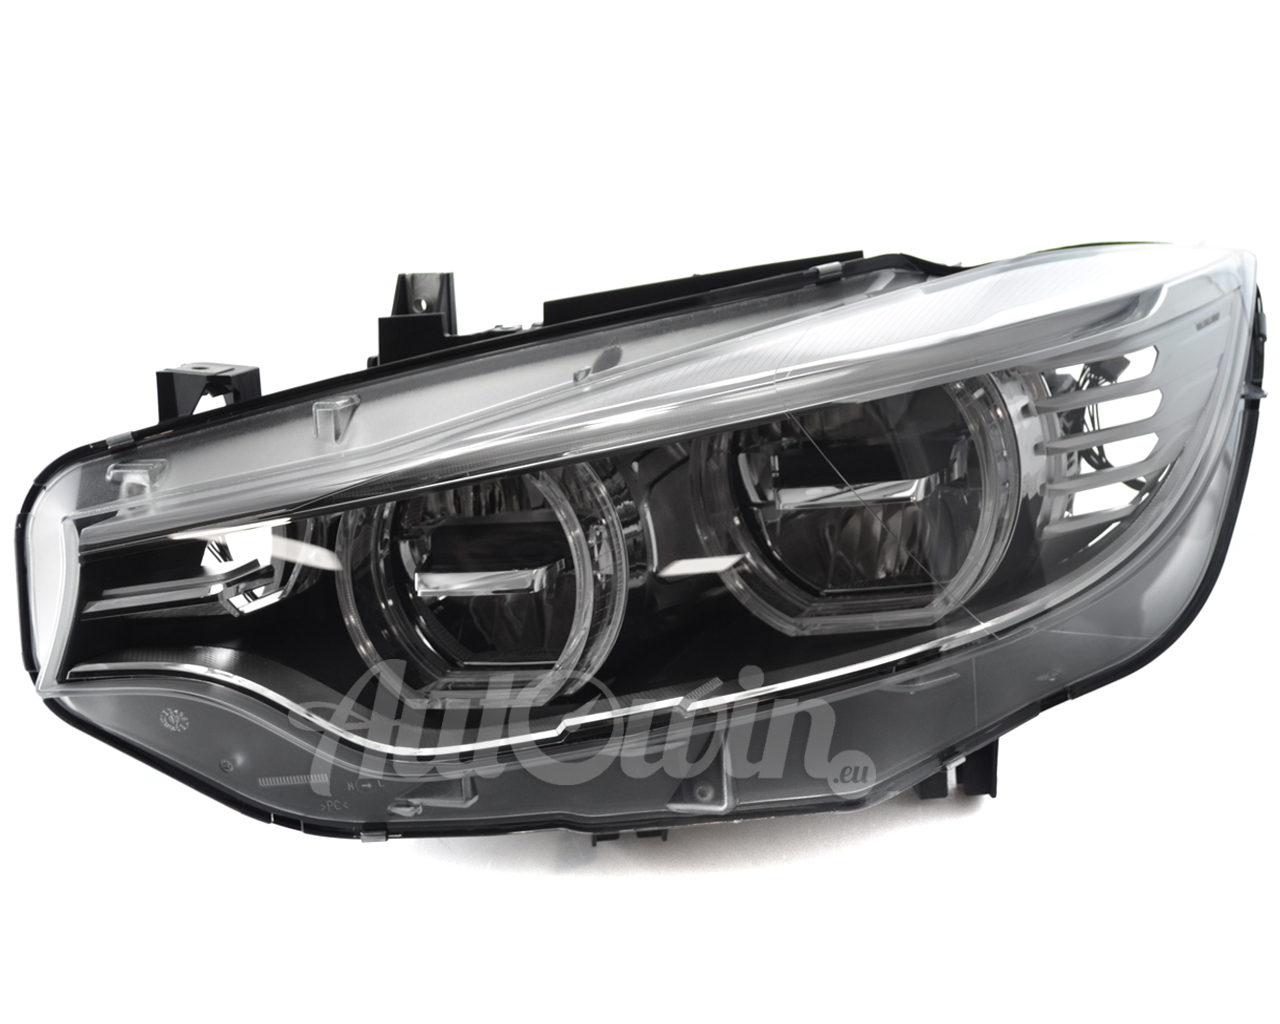 Bmw 4 Series F32 F33 Headlight Full Led Adaptive Left Lh